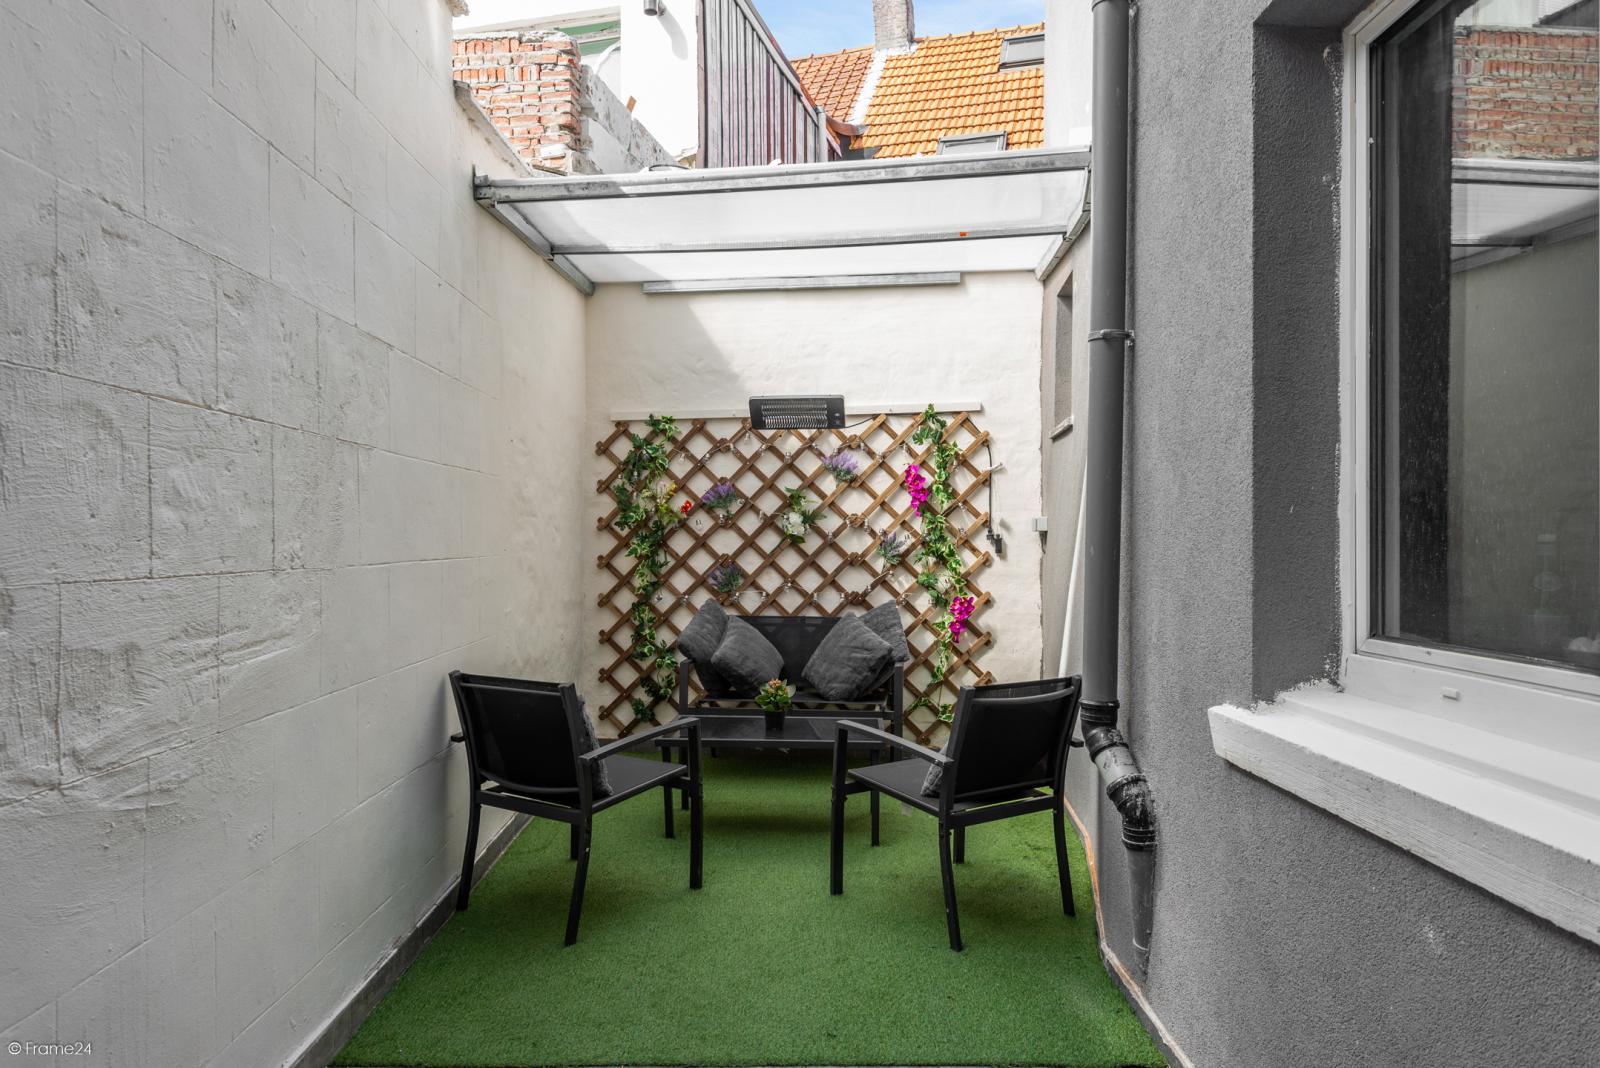 Zeer mooie bel-étage woning met inpandige garage en gezellige patio! afbeelding 13